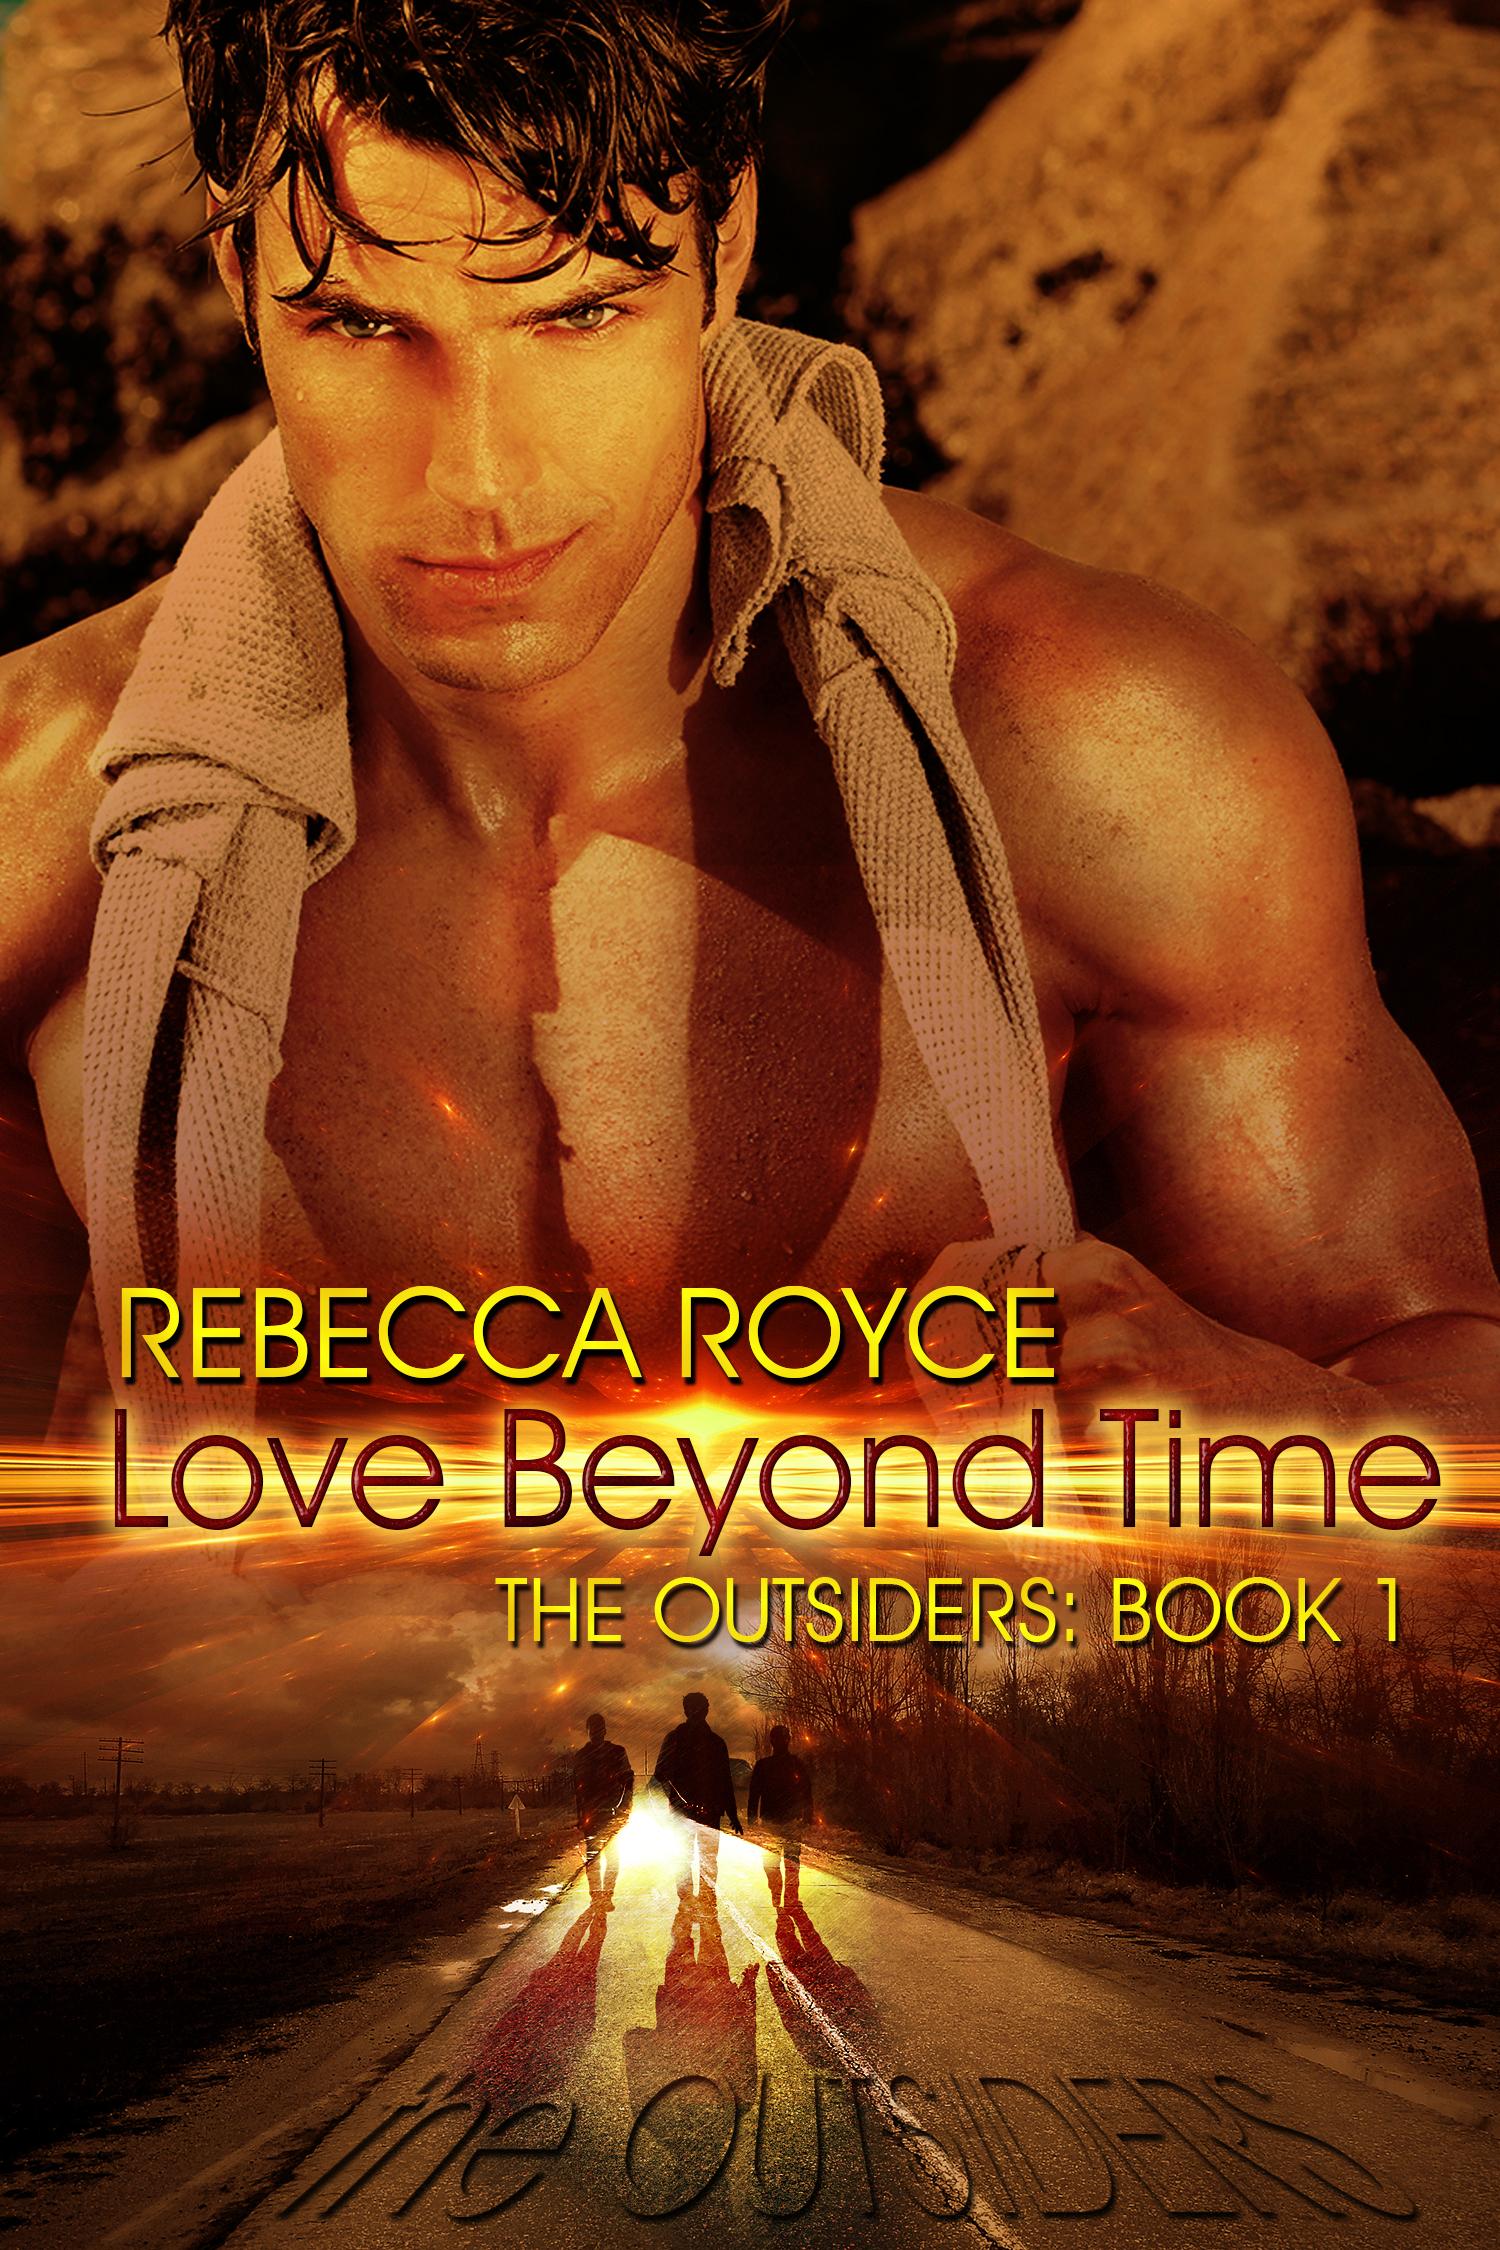 RebeccaRoyce_TheOutsiders_Book1_v1_LoveBeyondTime.jpg